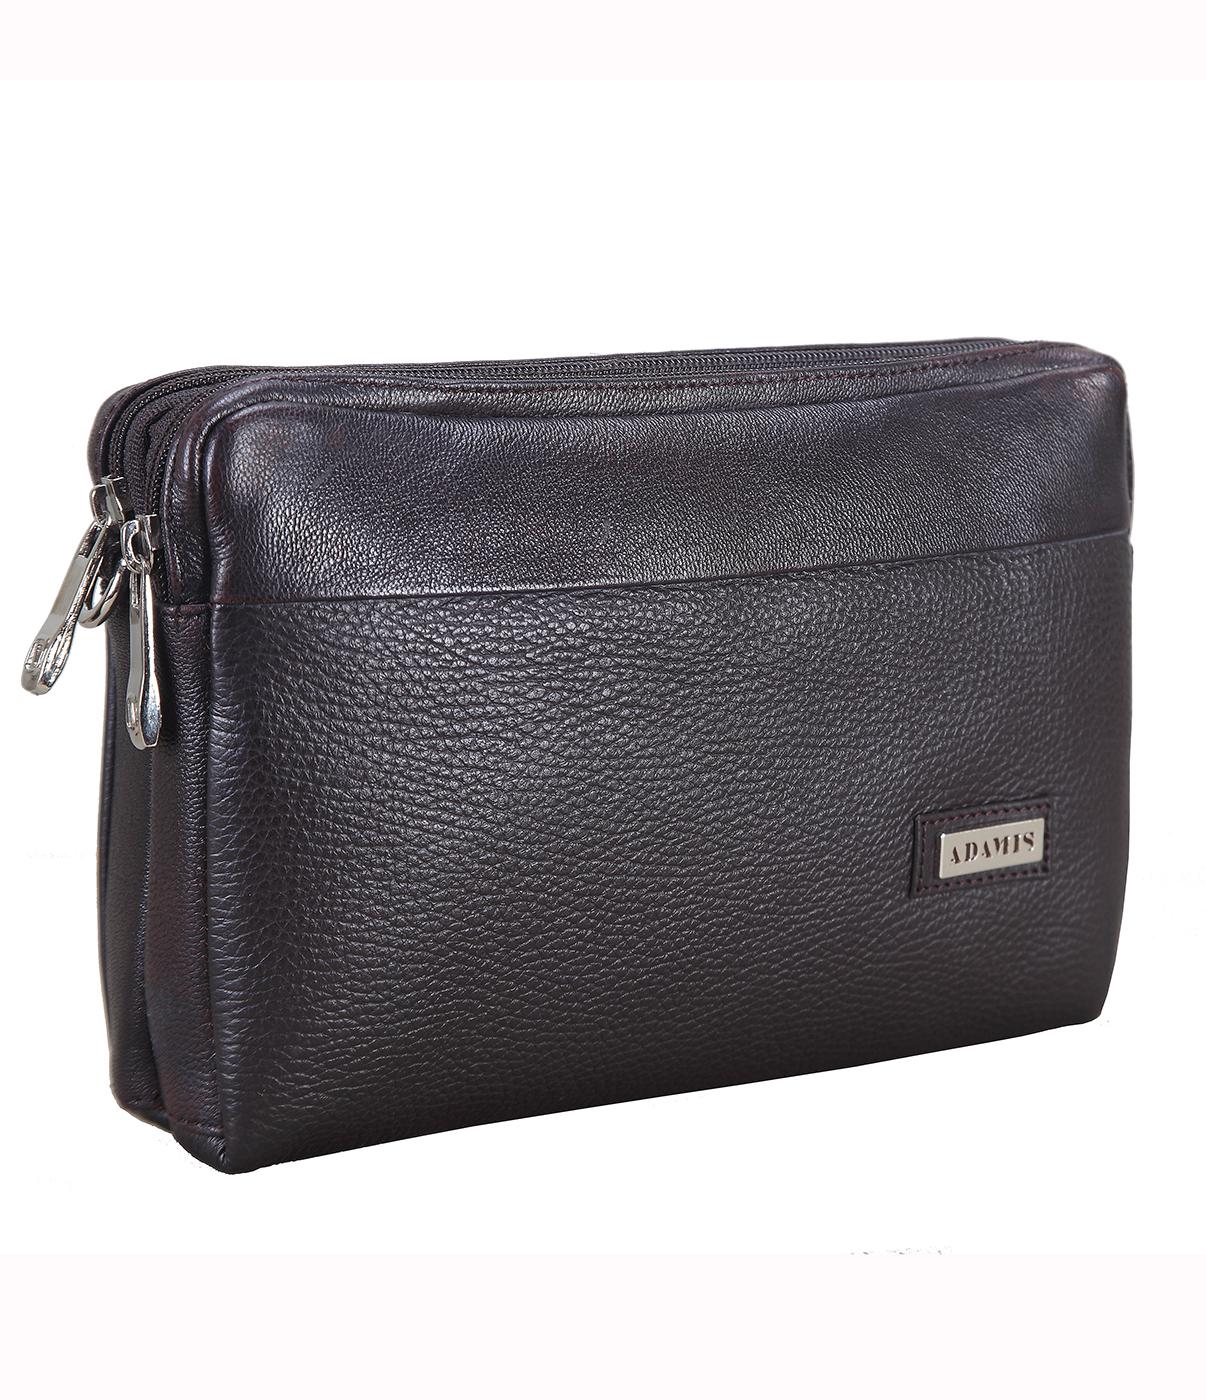 P20-Fernando-Men's bag cum travel pouch in Genuine Leather - Brown